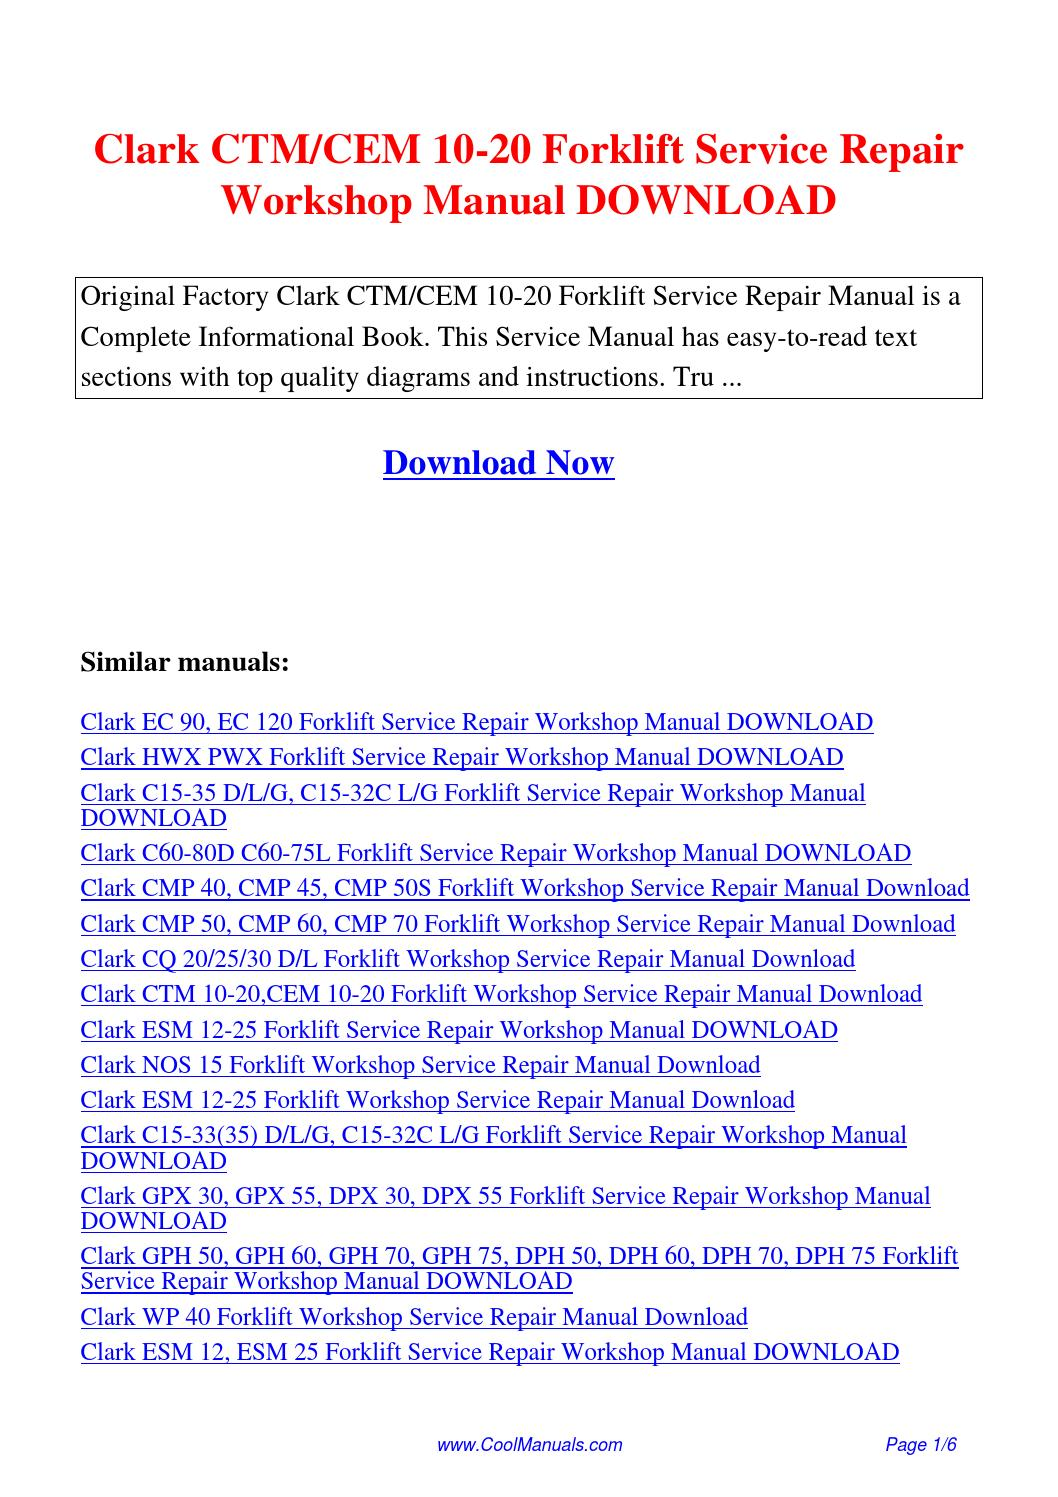 Clark CTM CEM 10-20 Forklift Service Repair Workshop Manual.pdf by Guang  Hui - issuu